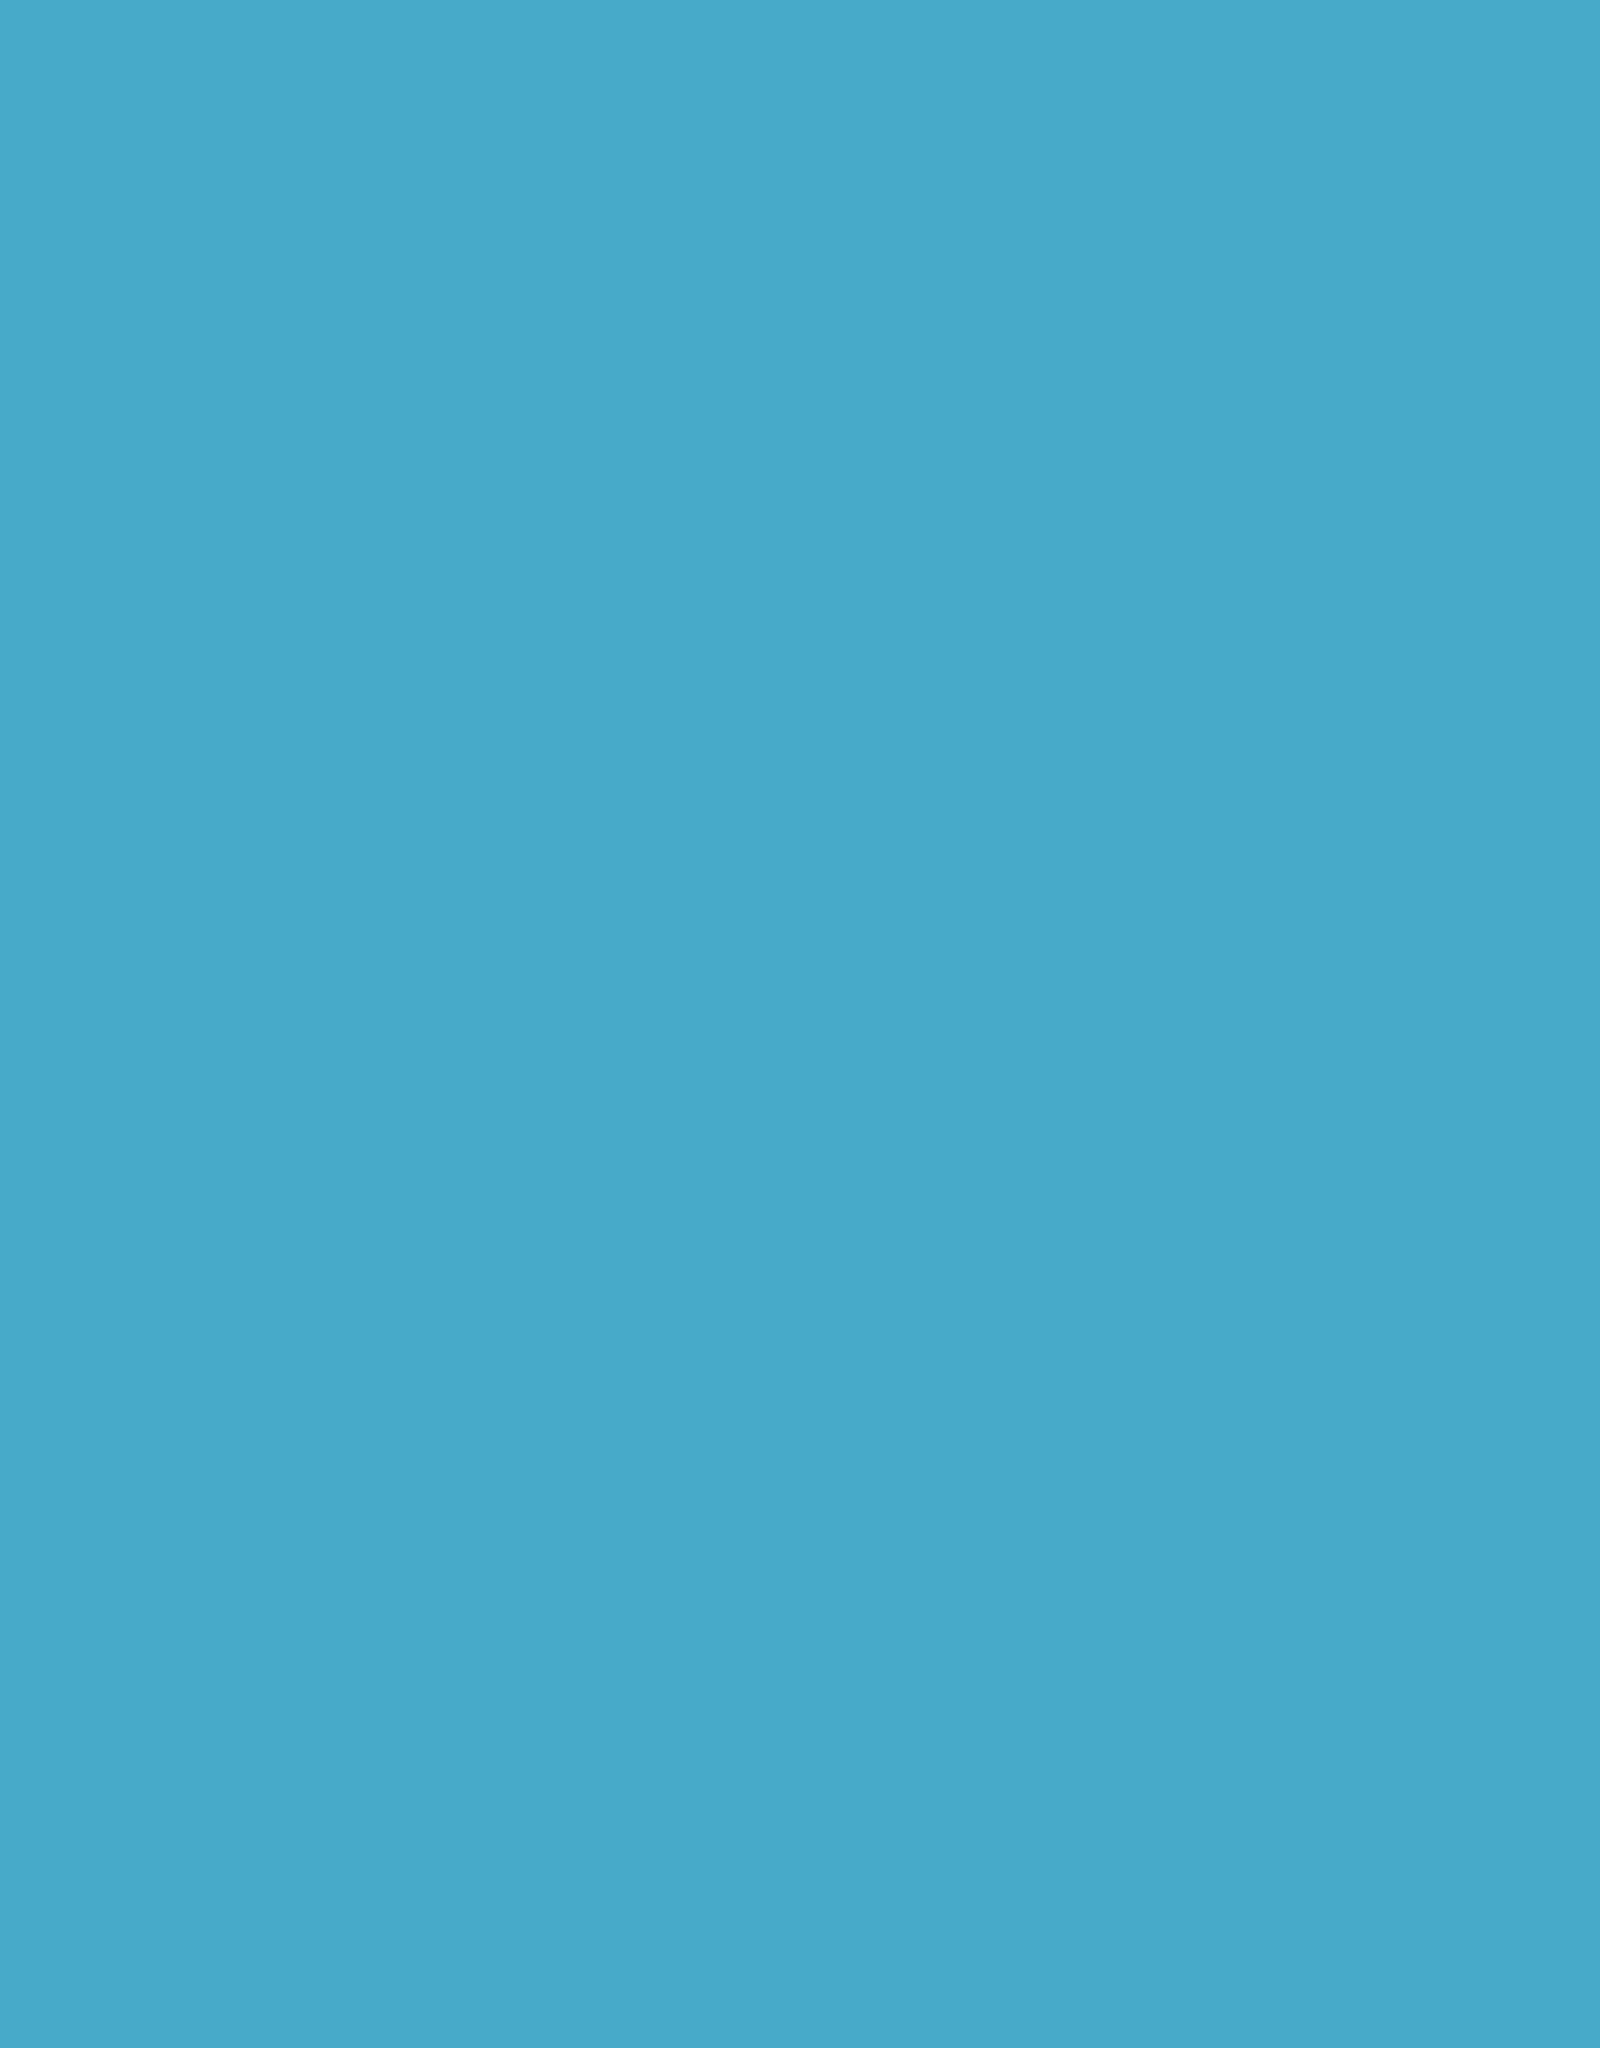 Trapsuutjies Sky Blue